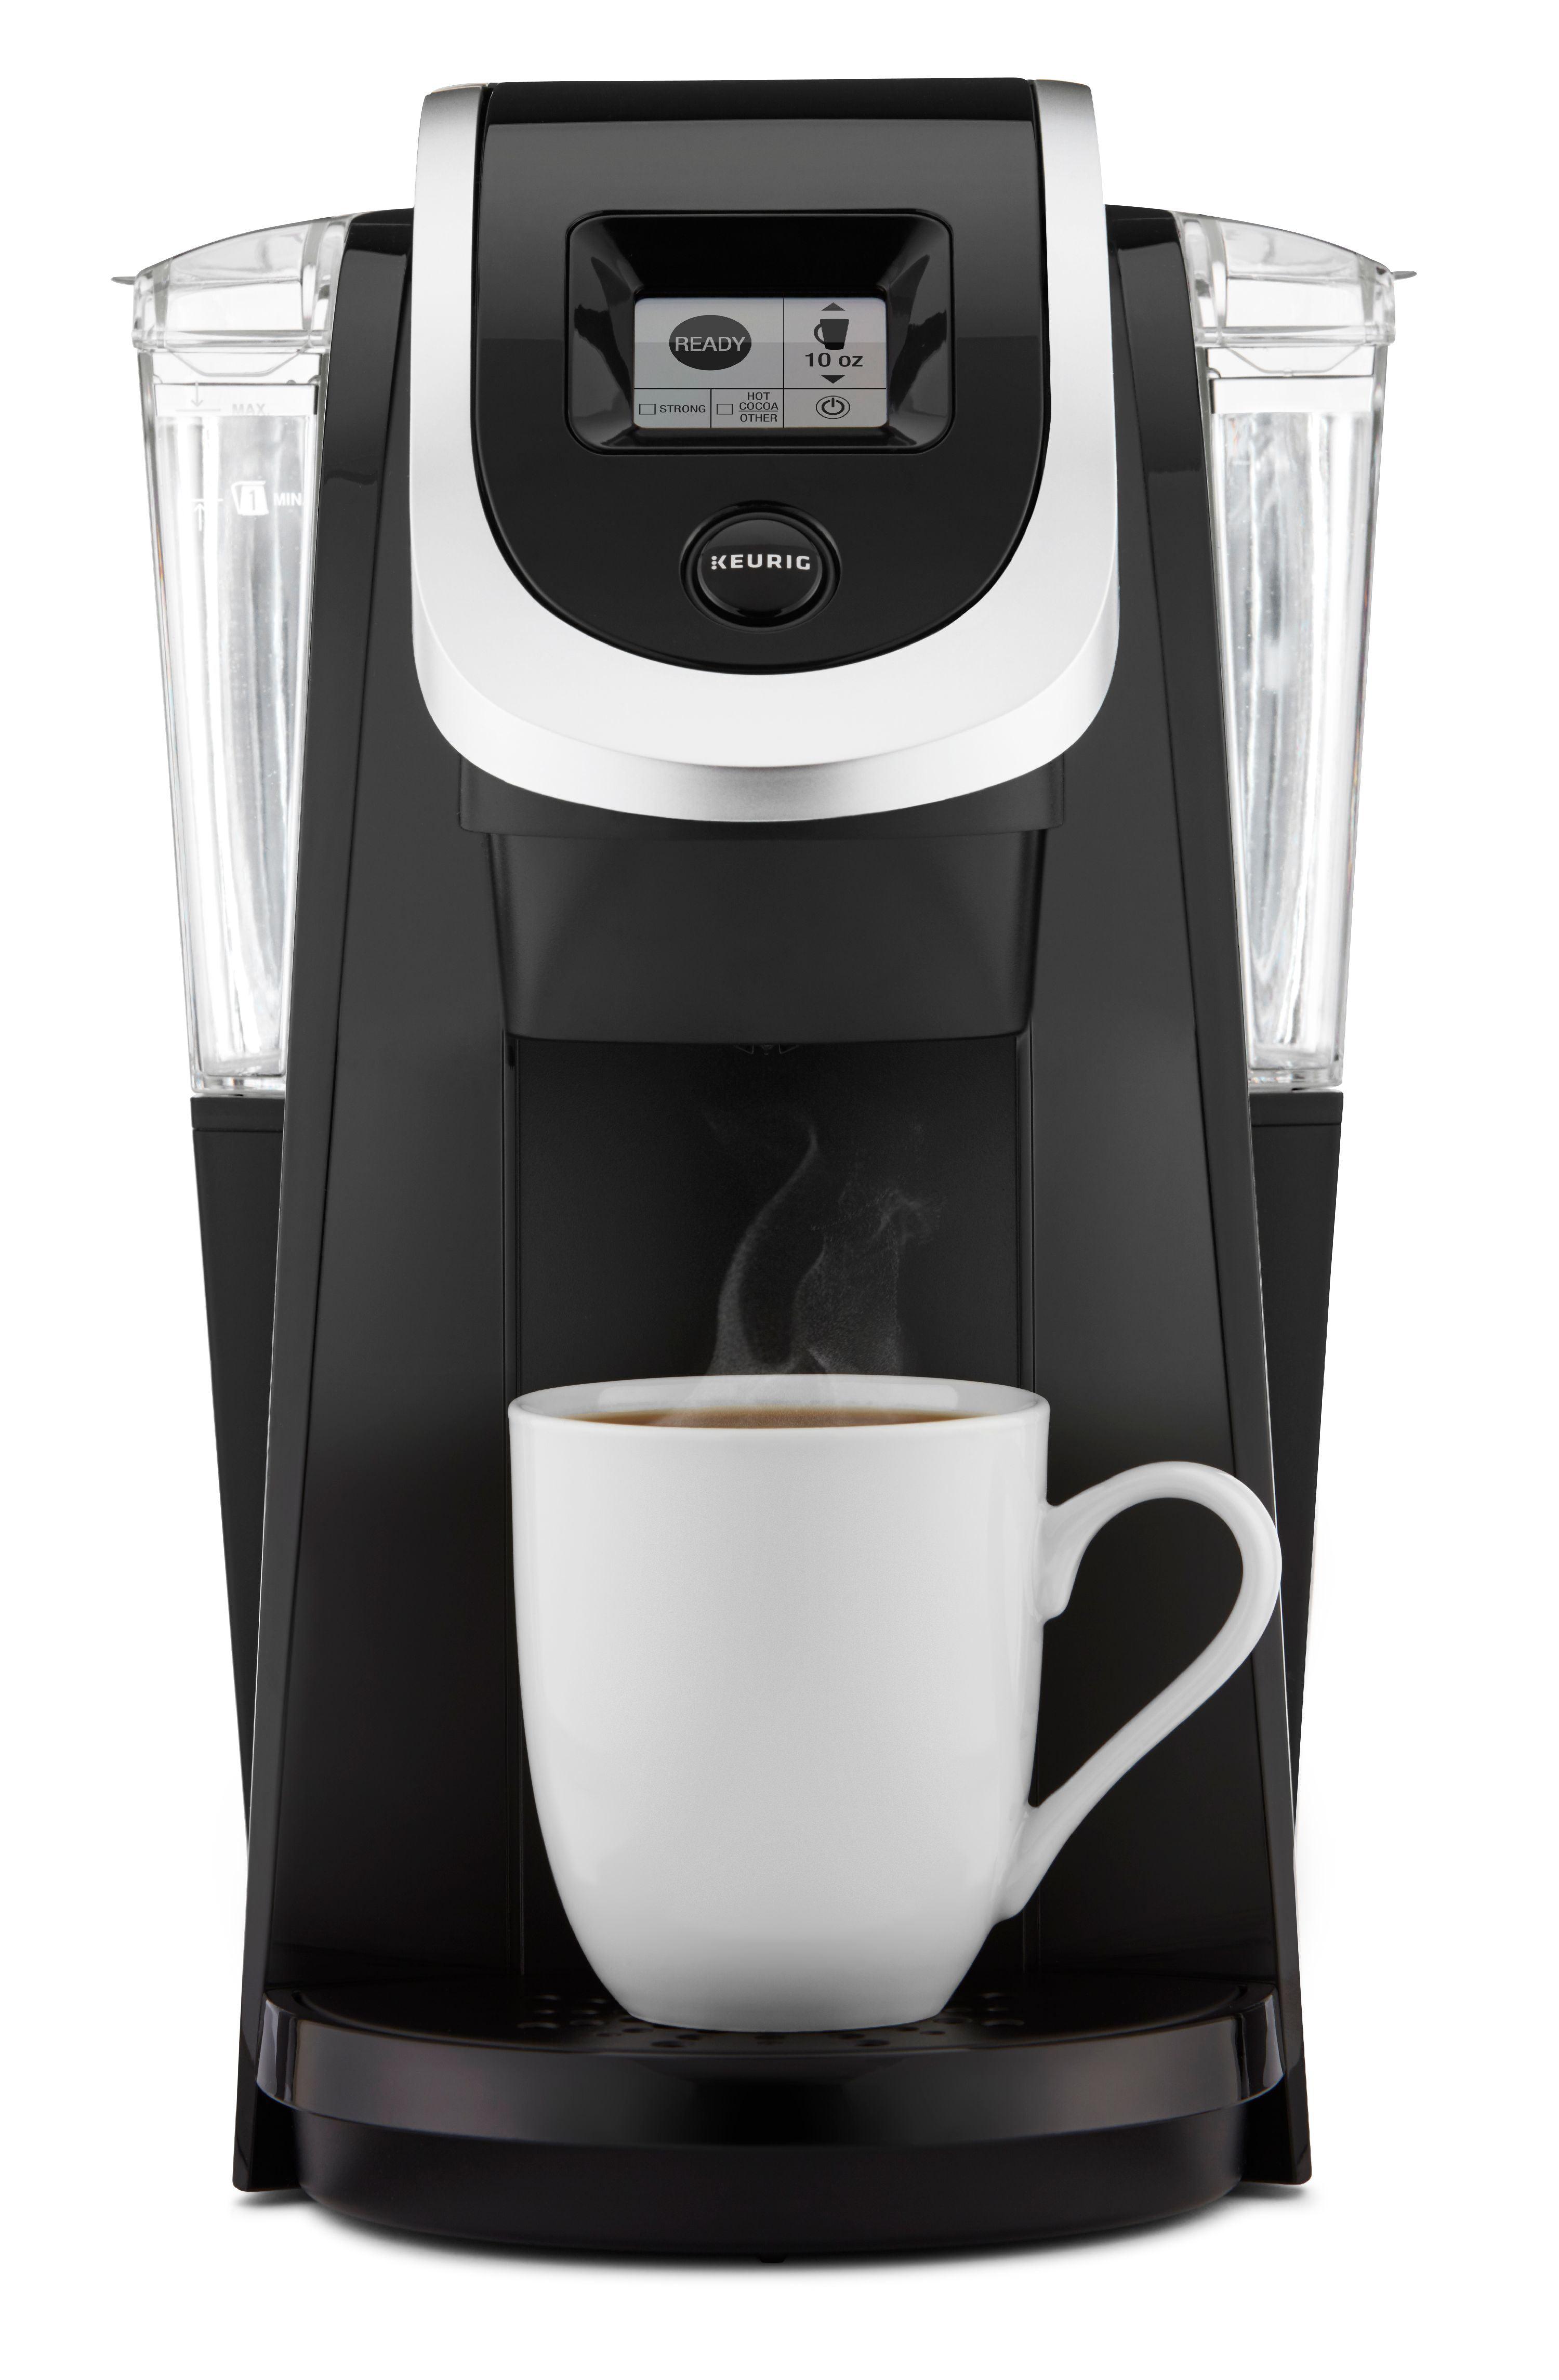 Keurig K200 Single Serve KCup Pod Coffee Maker with Strength